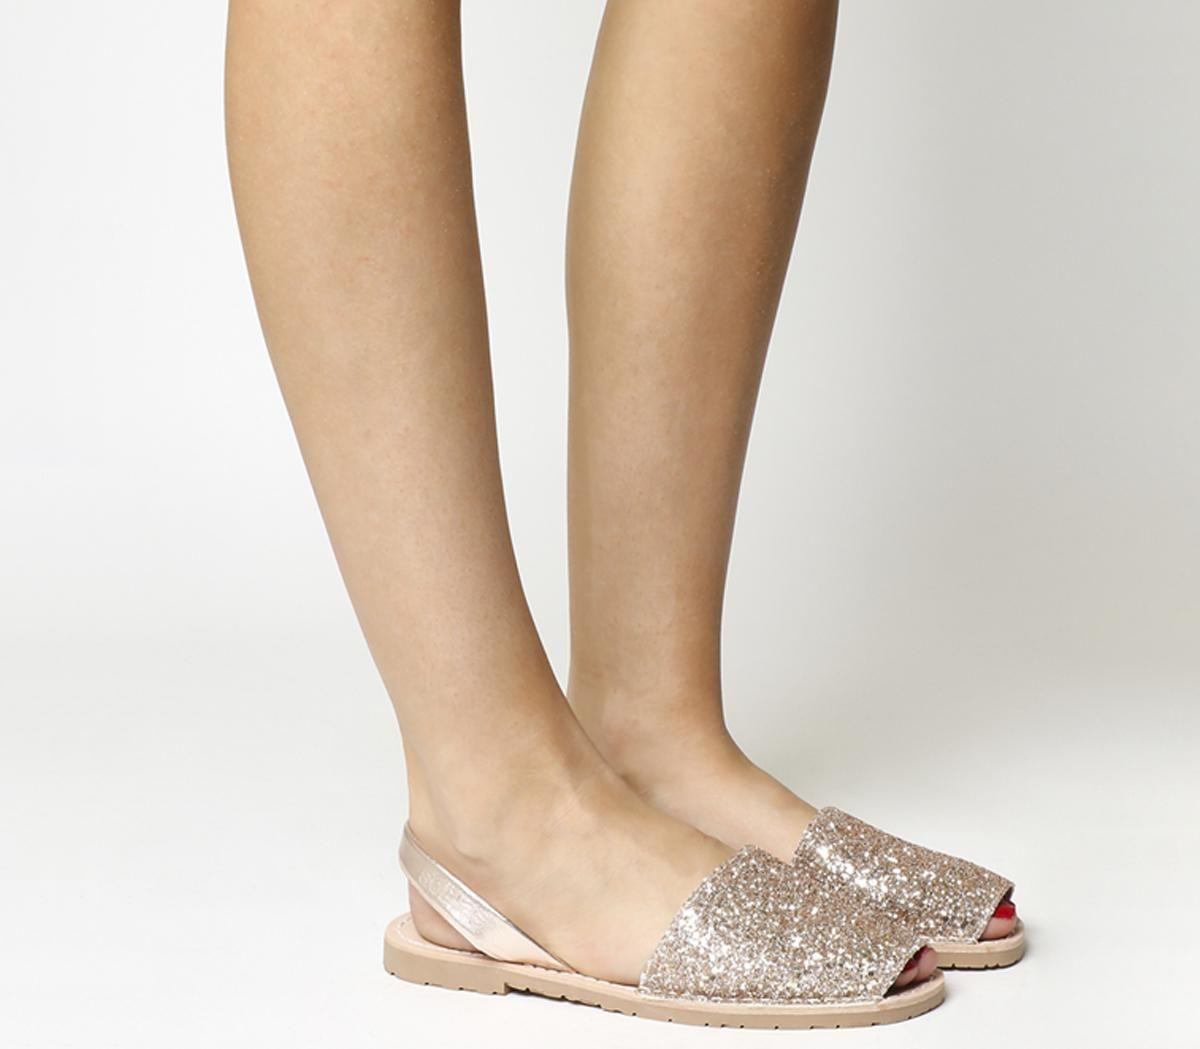 6b5894d5d1d2 Solillas Solillas Sandals Peach Glitter - Sandals